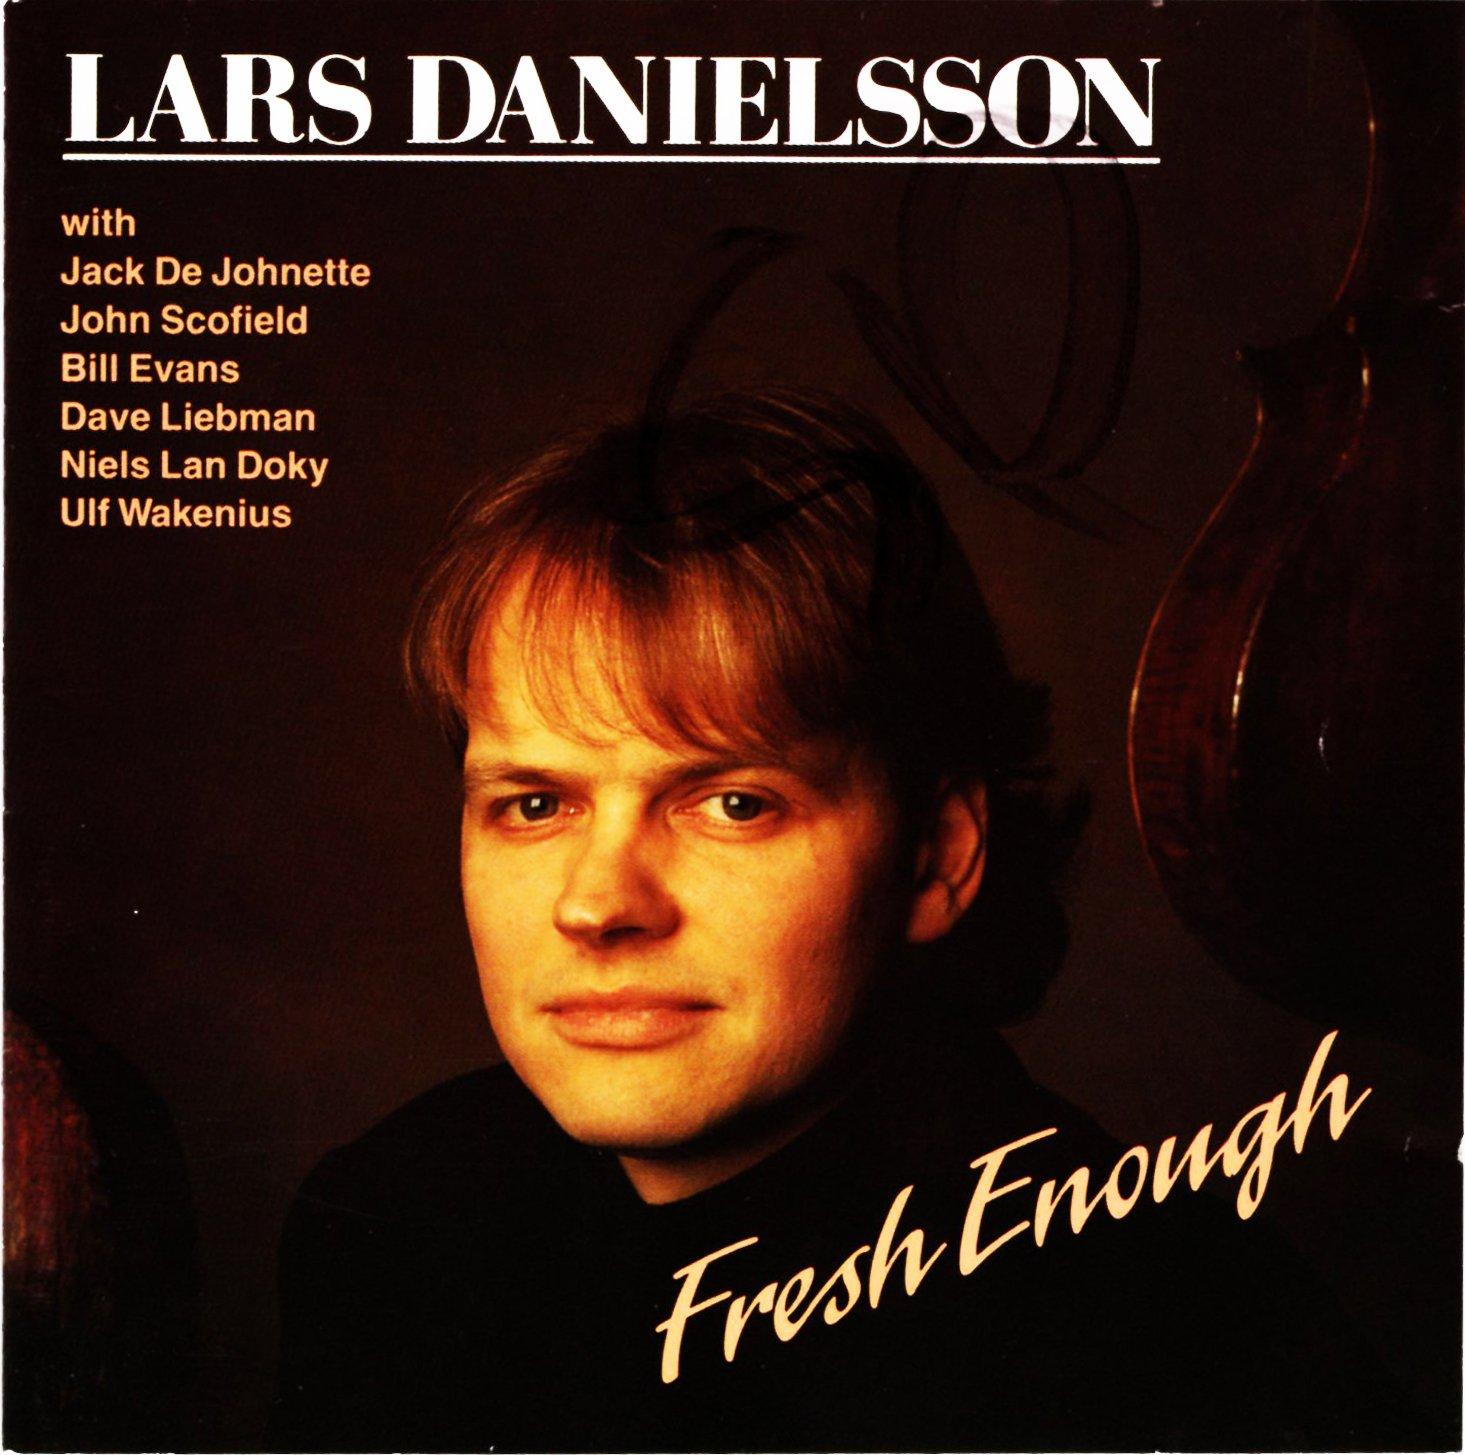 1992 - Lars Danielsson - Fresh Enough.jpg